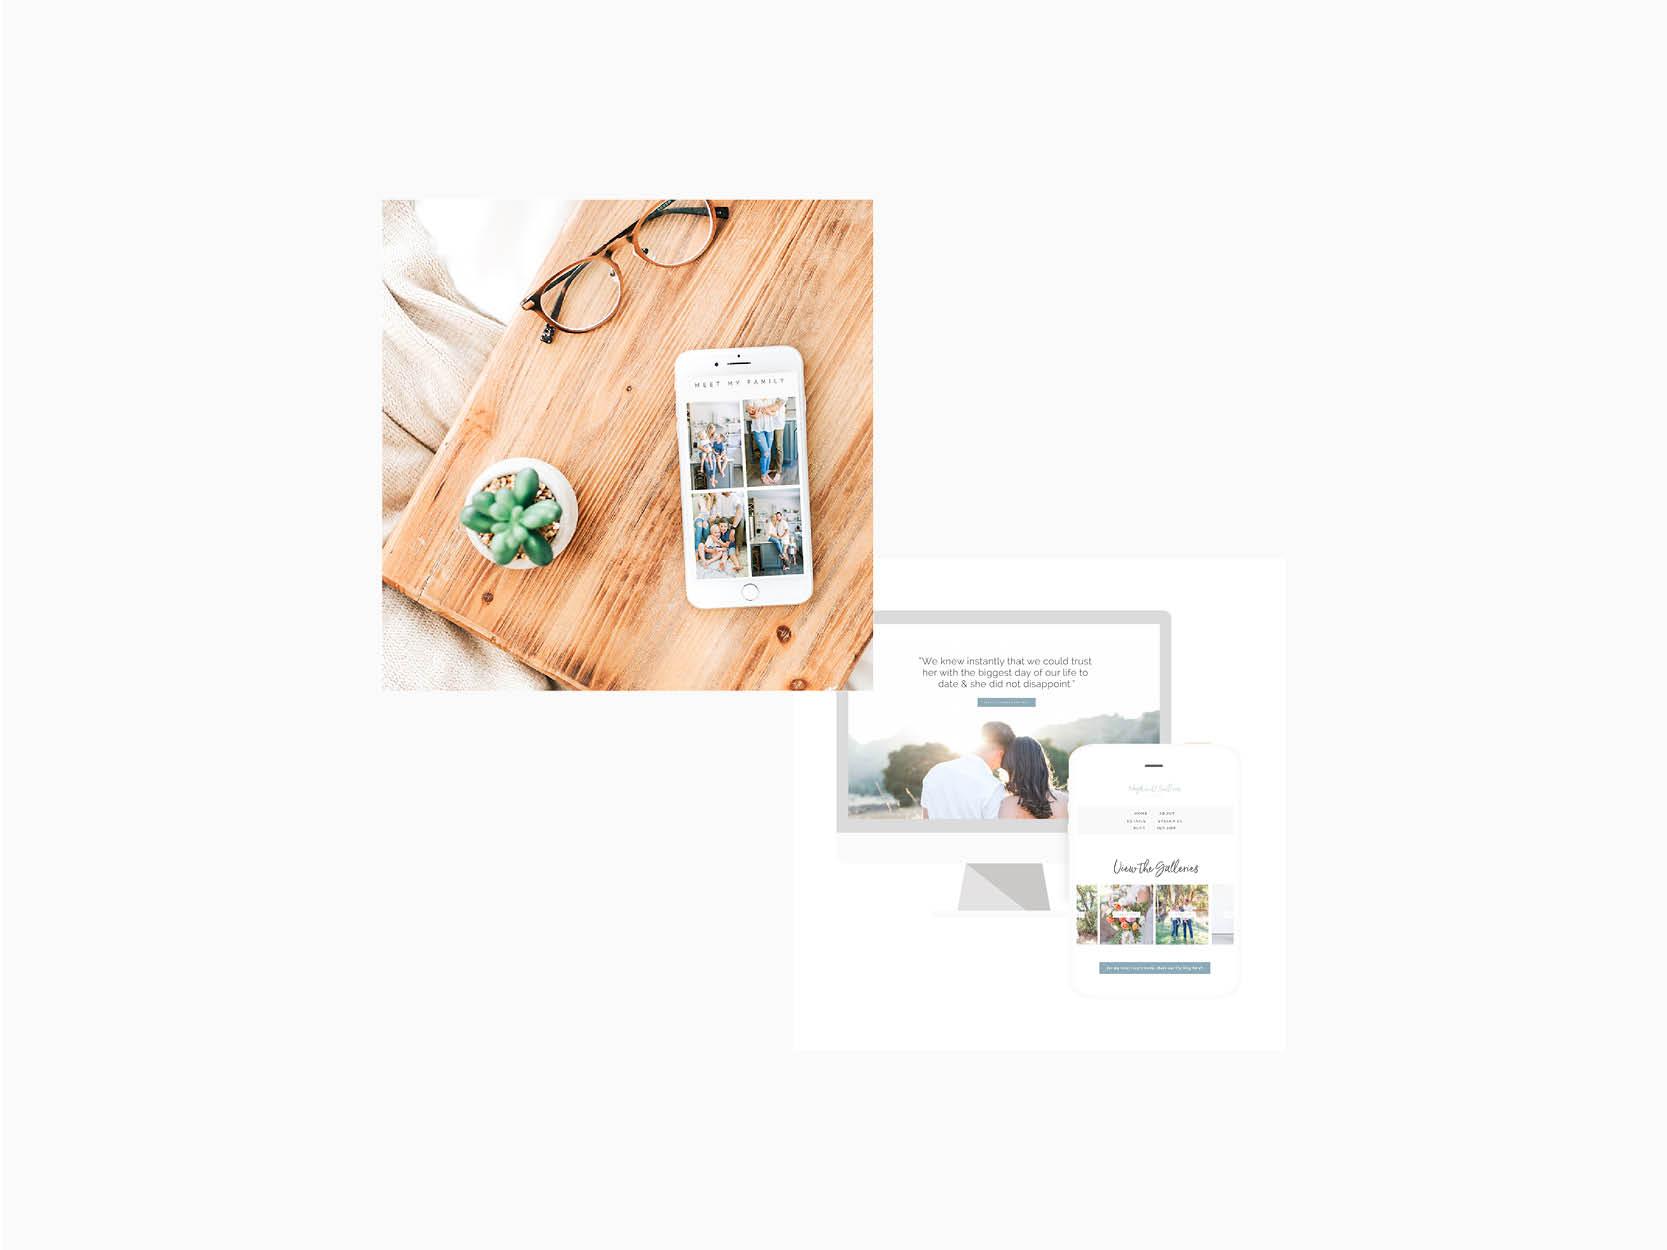 Meghan O'Sullivan Photography custom Squarespace website design by Emma Rose Company.  #squarespace #photographer #beautifulbranding